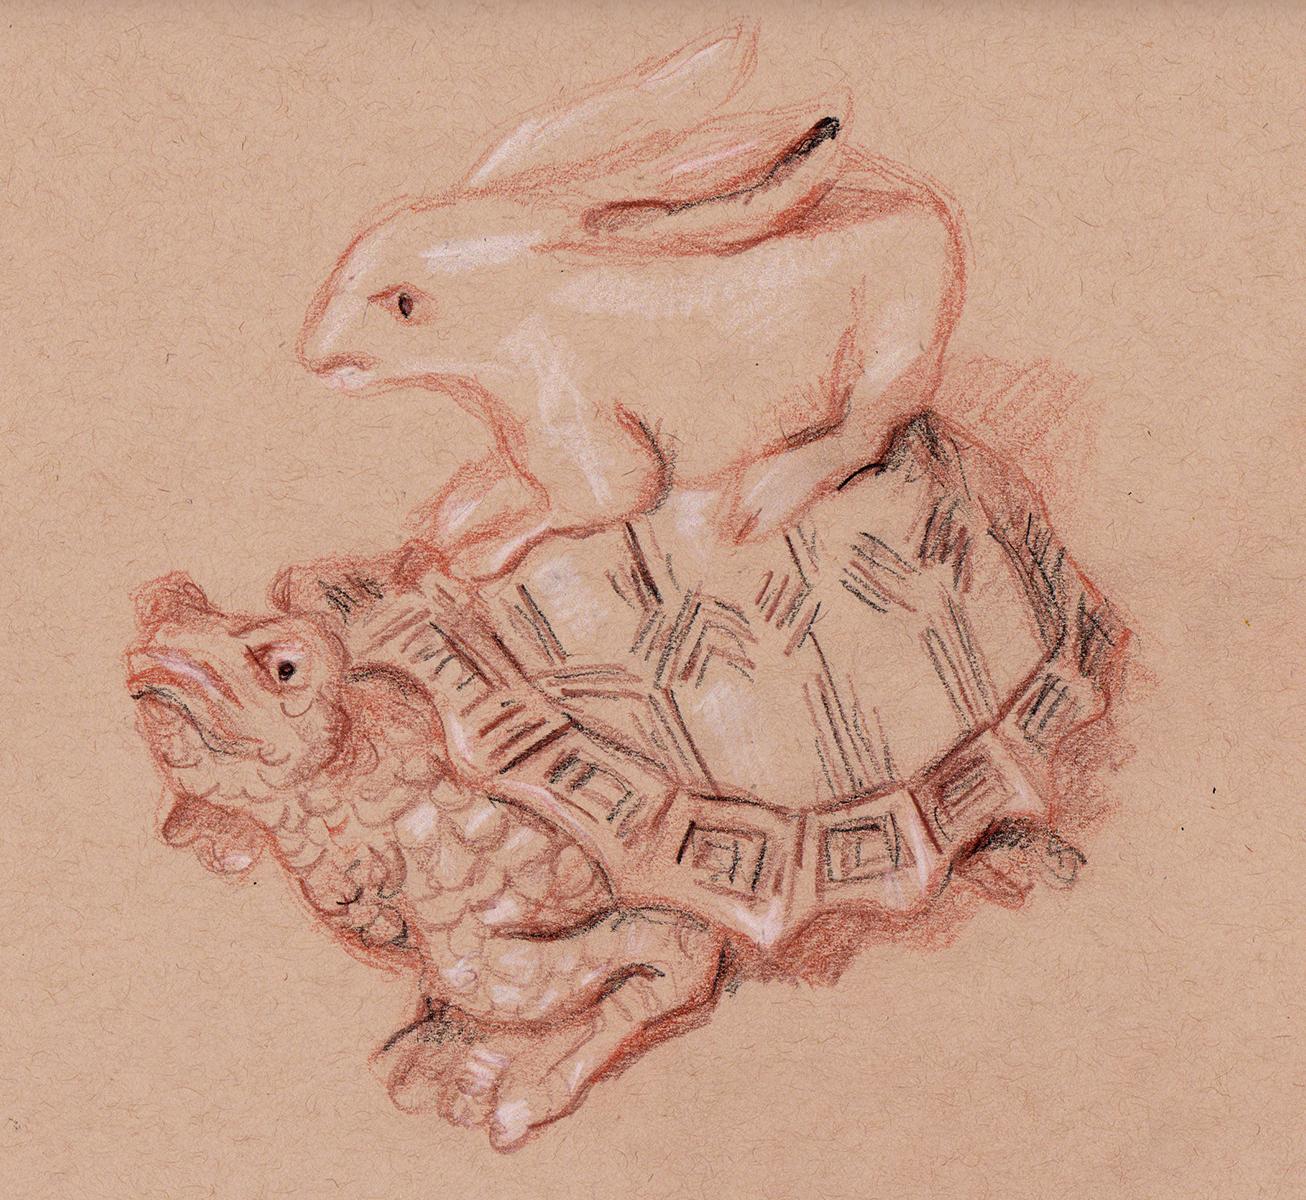 KR3_turtle netsuke with rabbit_wombwell